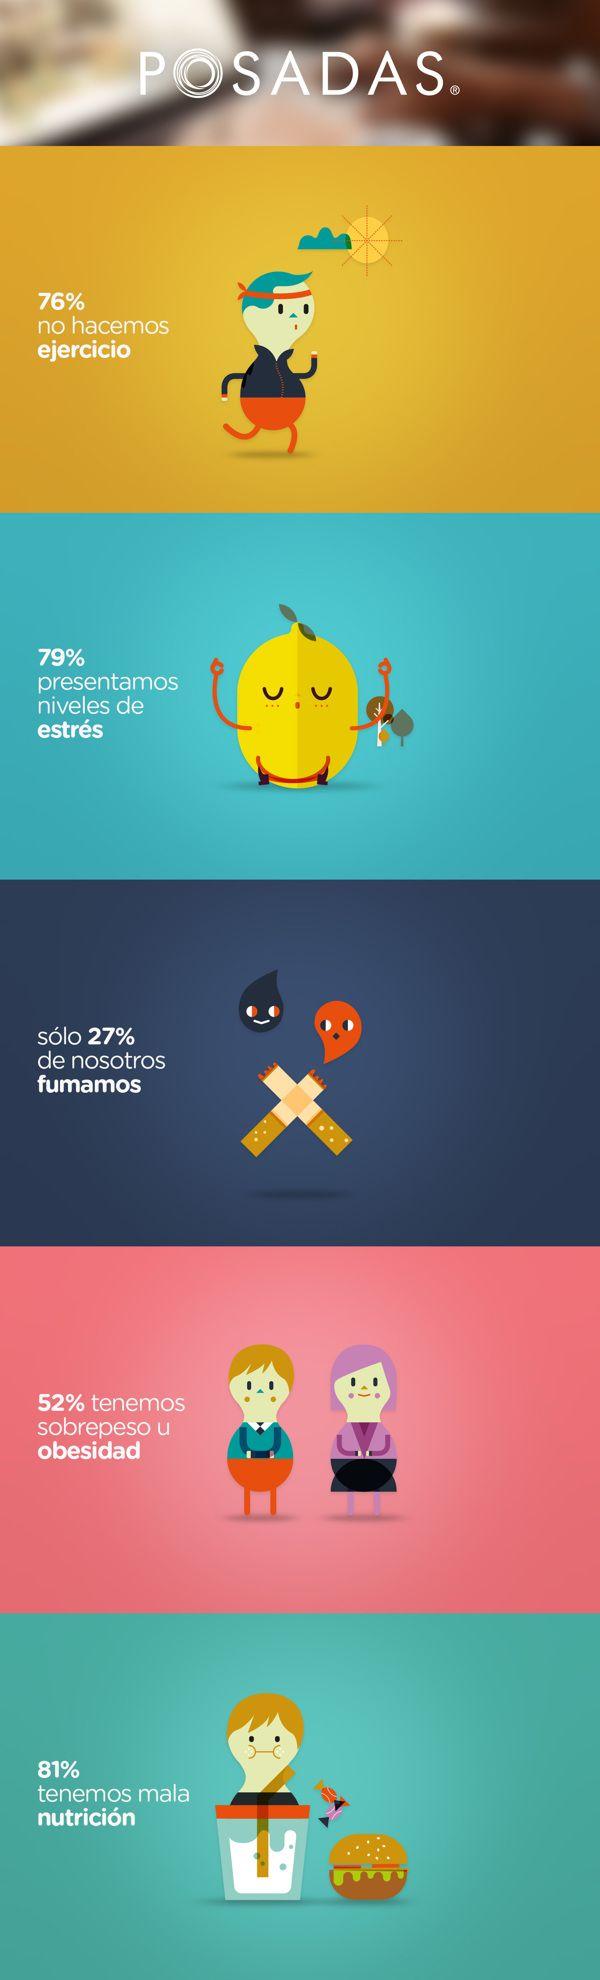 SOS Salud · Grupo Posadas by Cherry Bomb Design Studio, via Behance